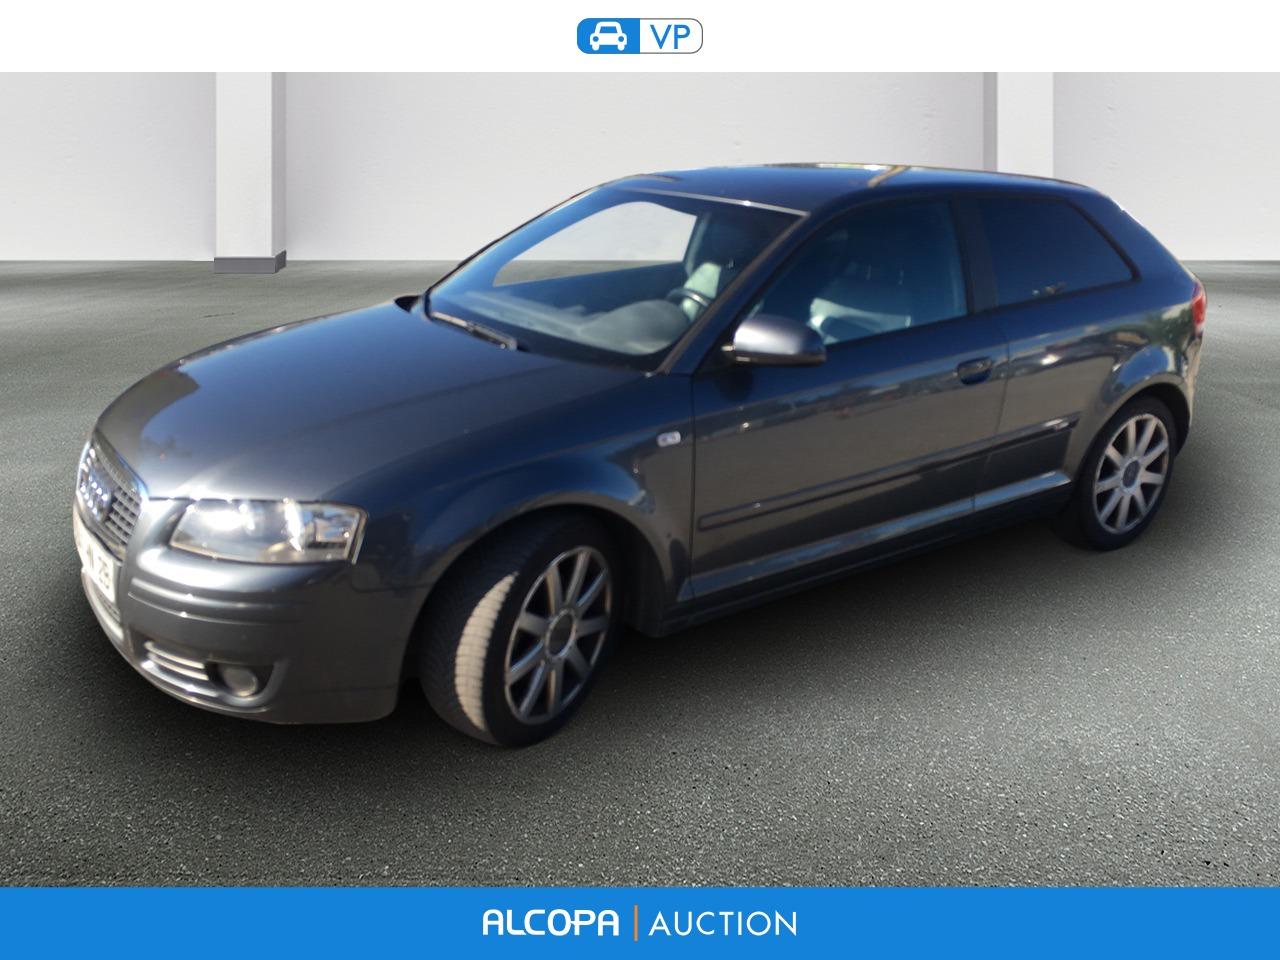 Audi A3 052005 042008 A3 20 Tdi S Line Alcopa Auction